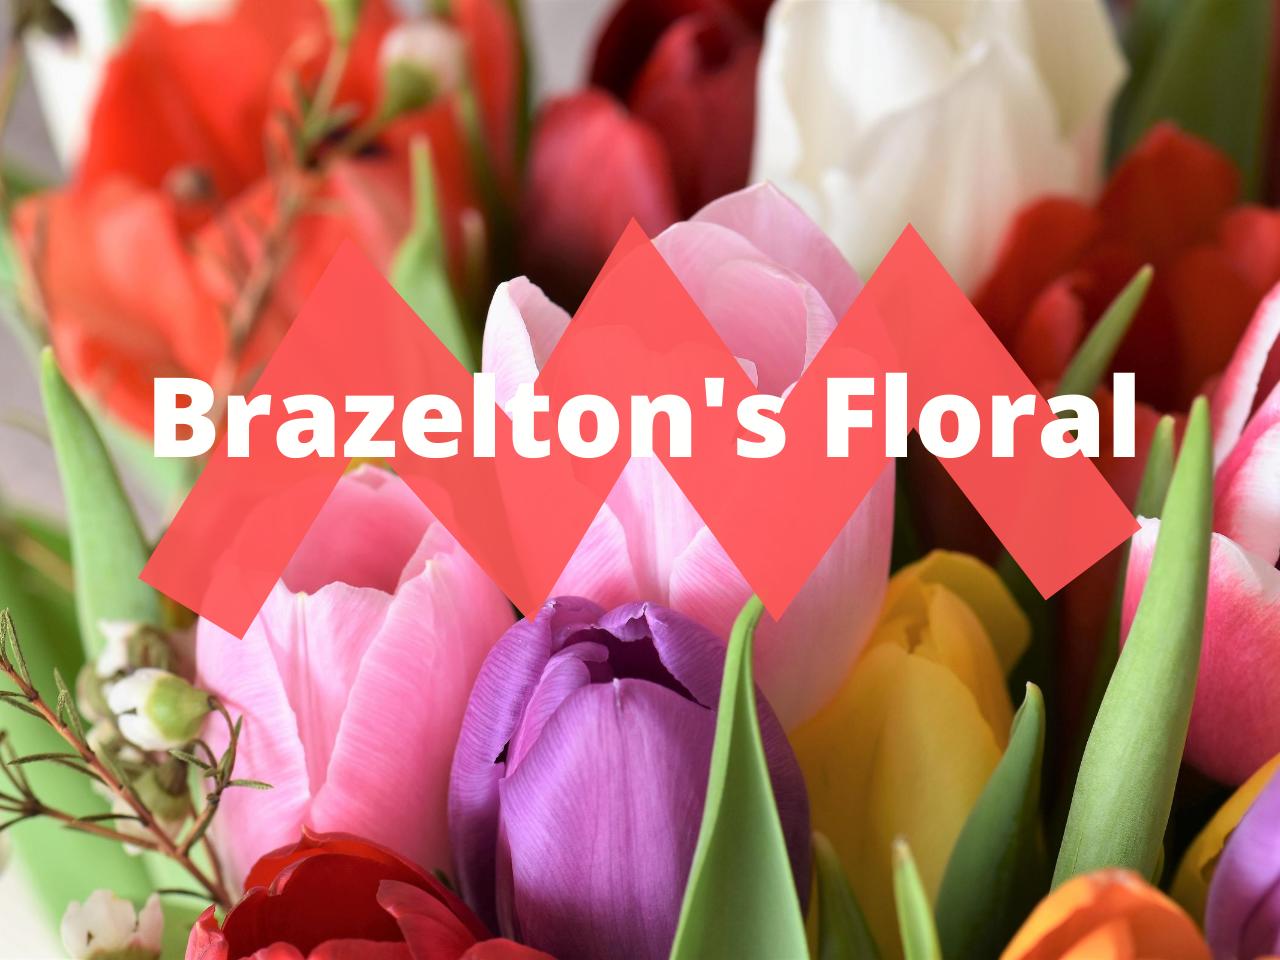 Brazelton's Floral